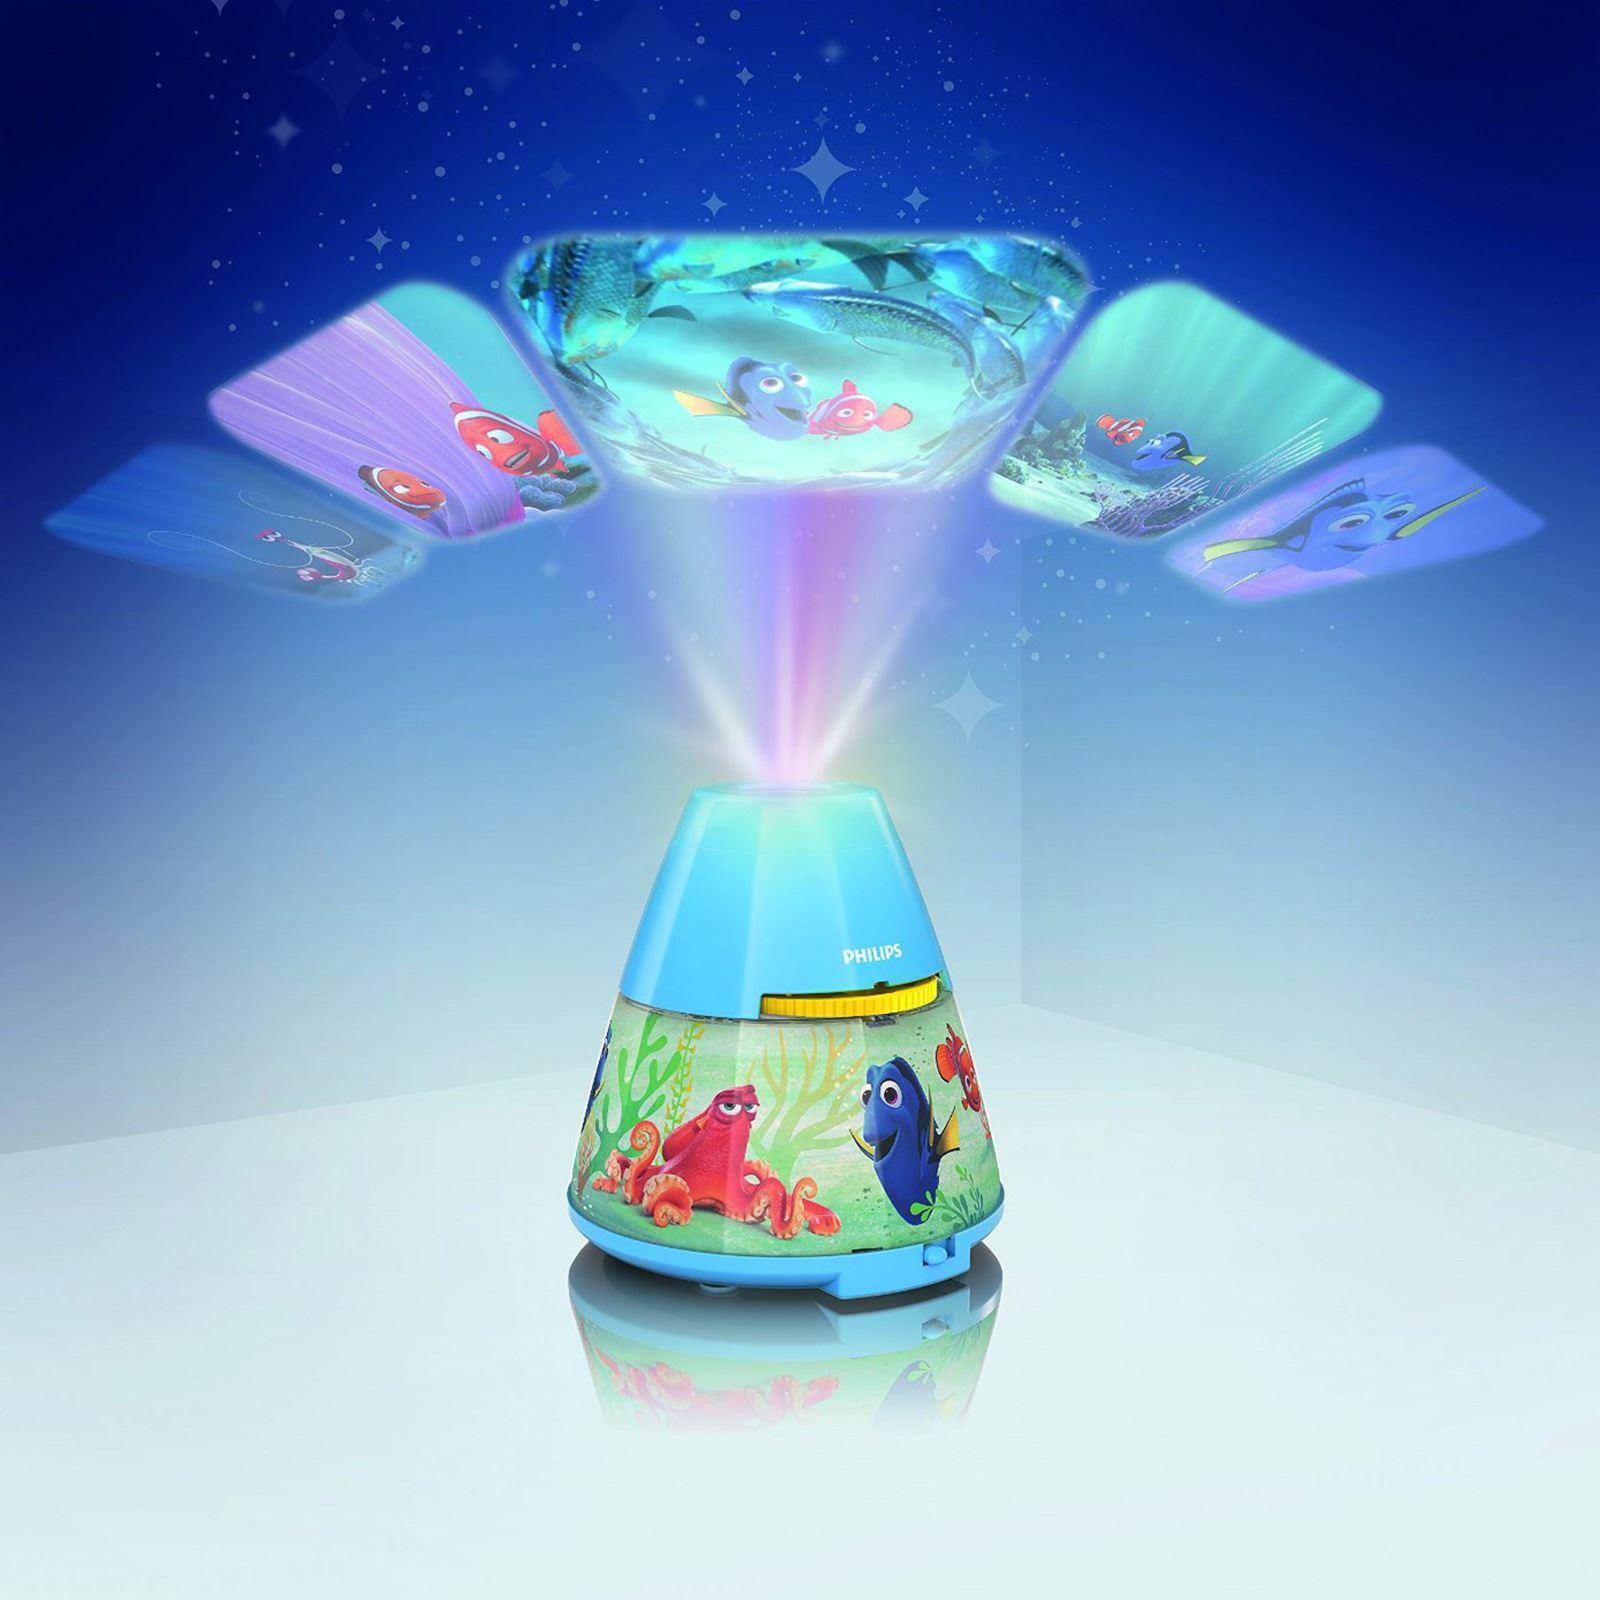 philips night light projector finding dory star wars. Black Bedroom Furniture Sets. Home Design Ideas